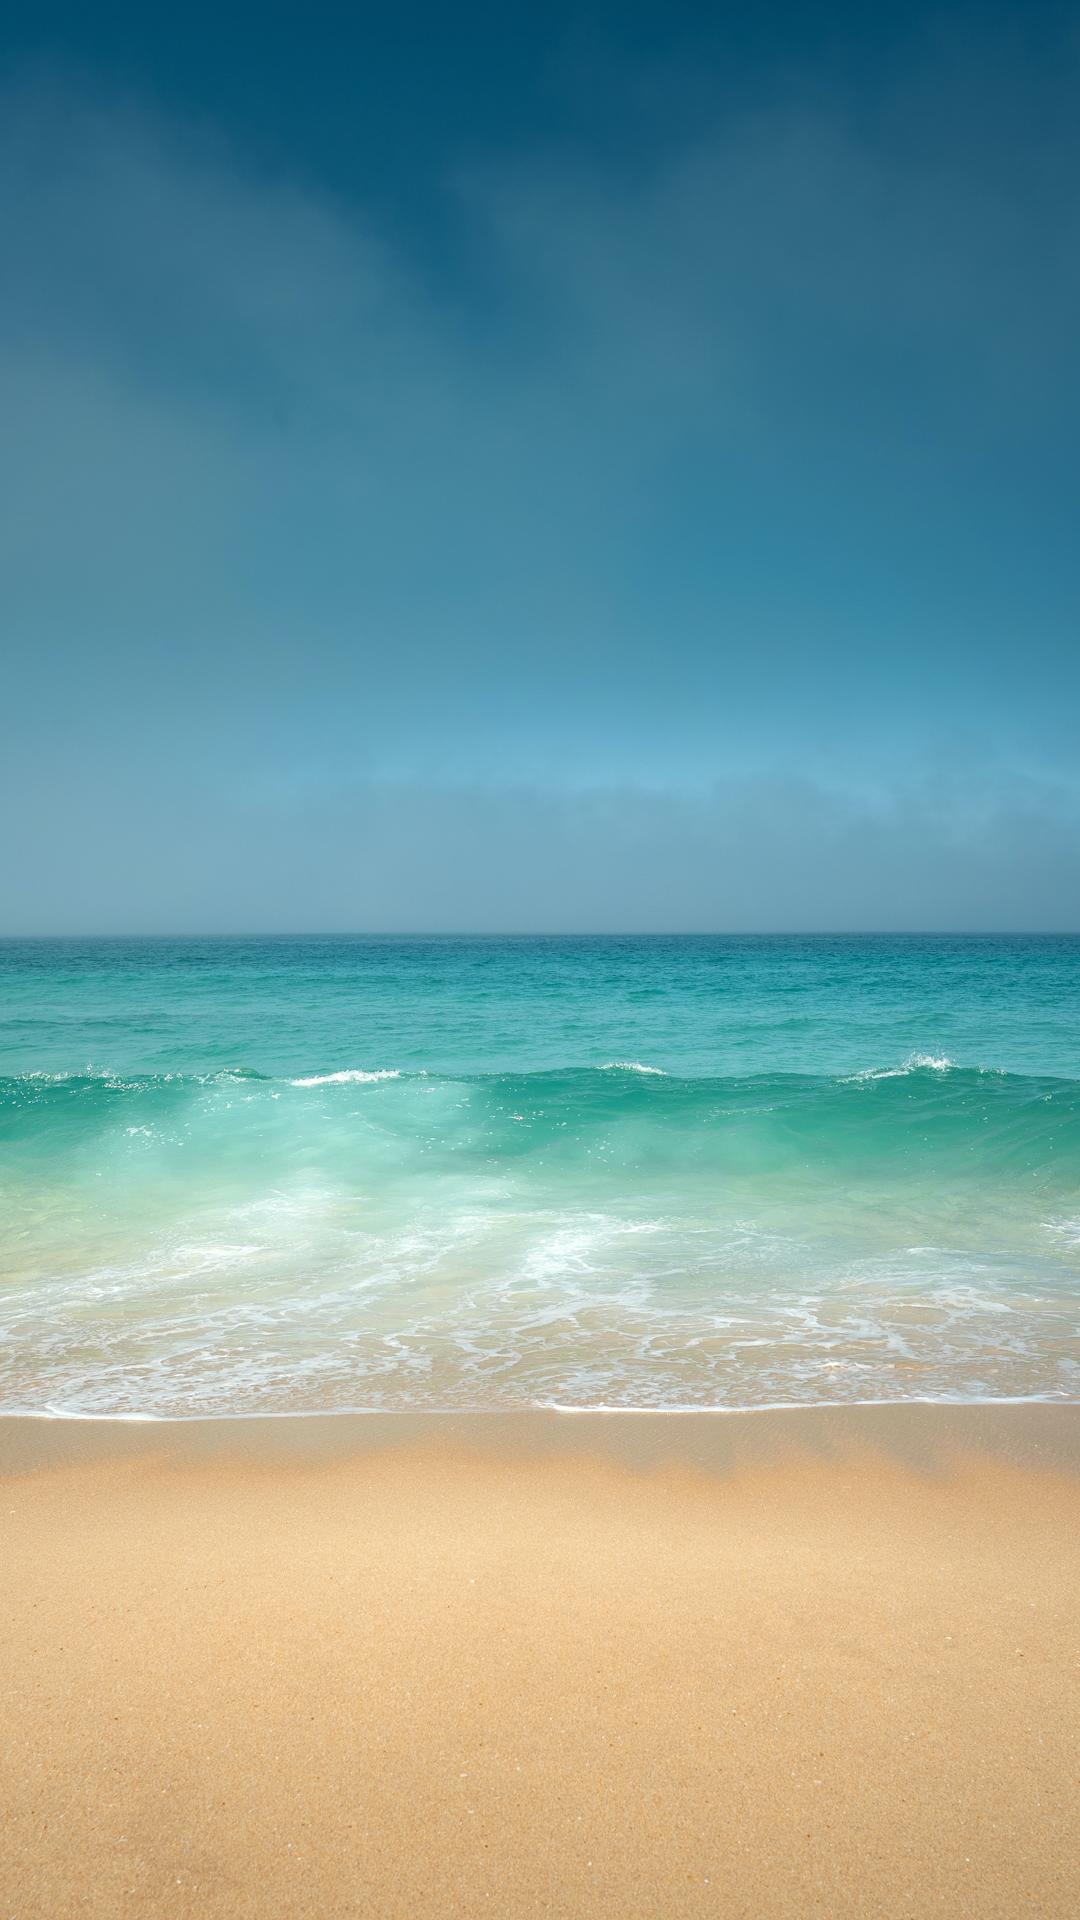 Ocean Aesthetic Wallpaper For iPhone